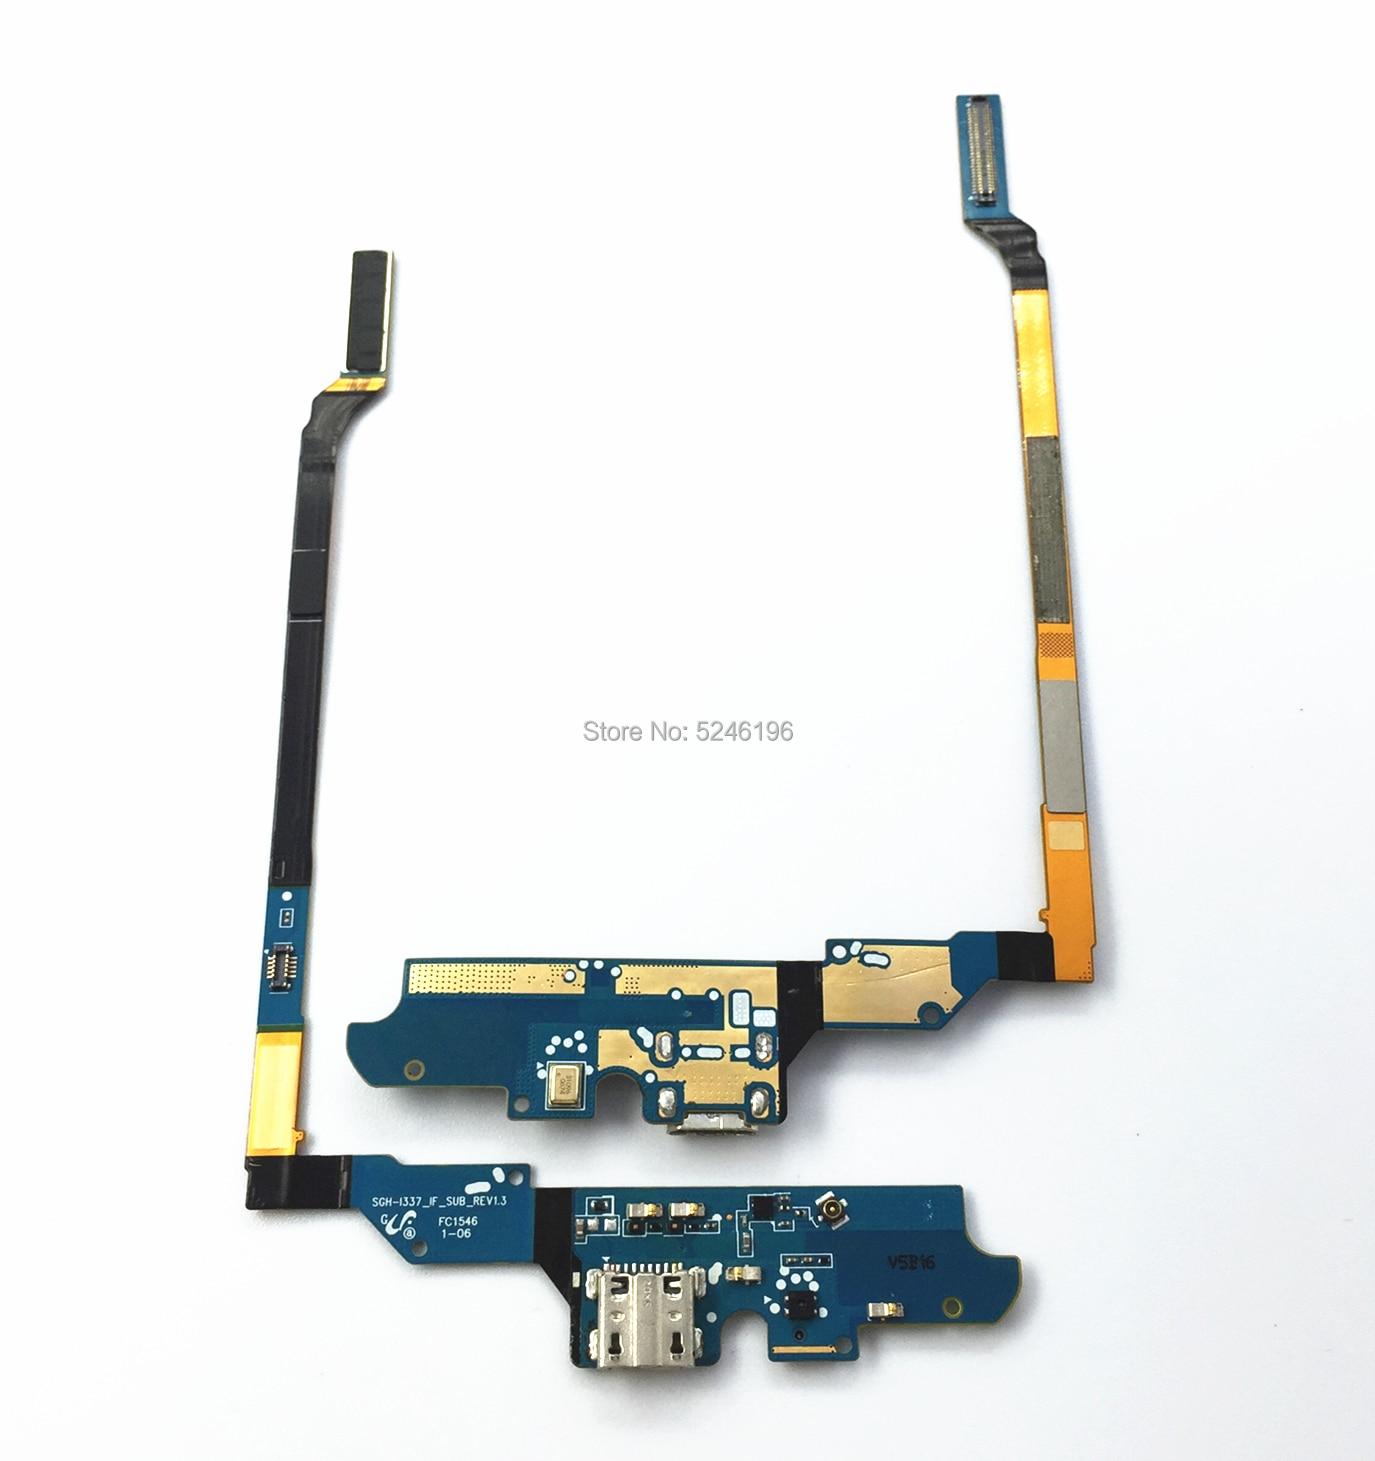 1pcs Original USB Charger Board Charging Port Connector Dock Flex Cable For Samsung Galaxy S4 I9500 M919 I337 I9505 Mic Parts